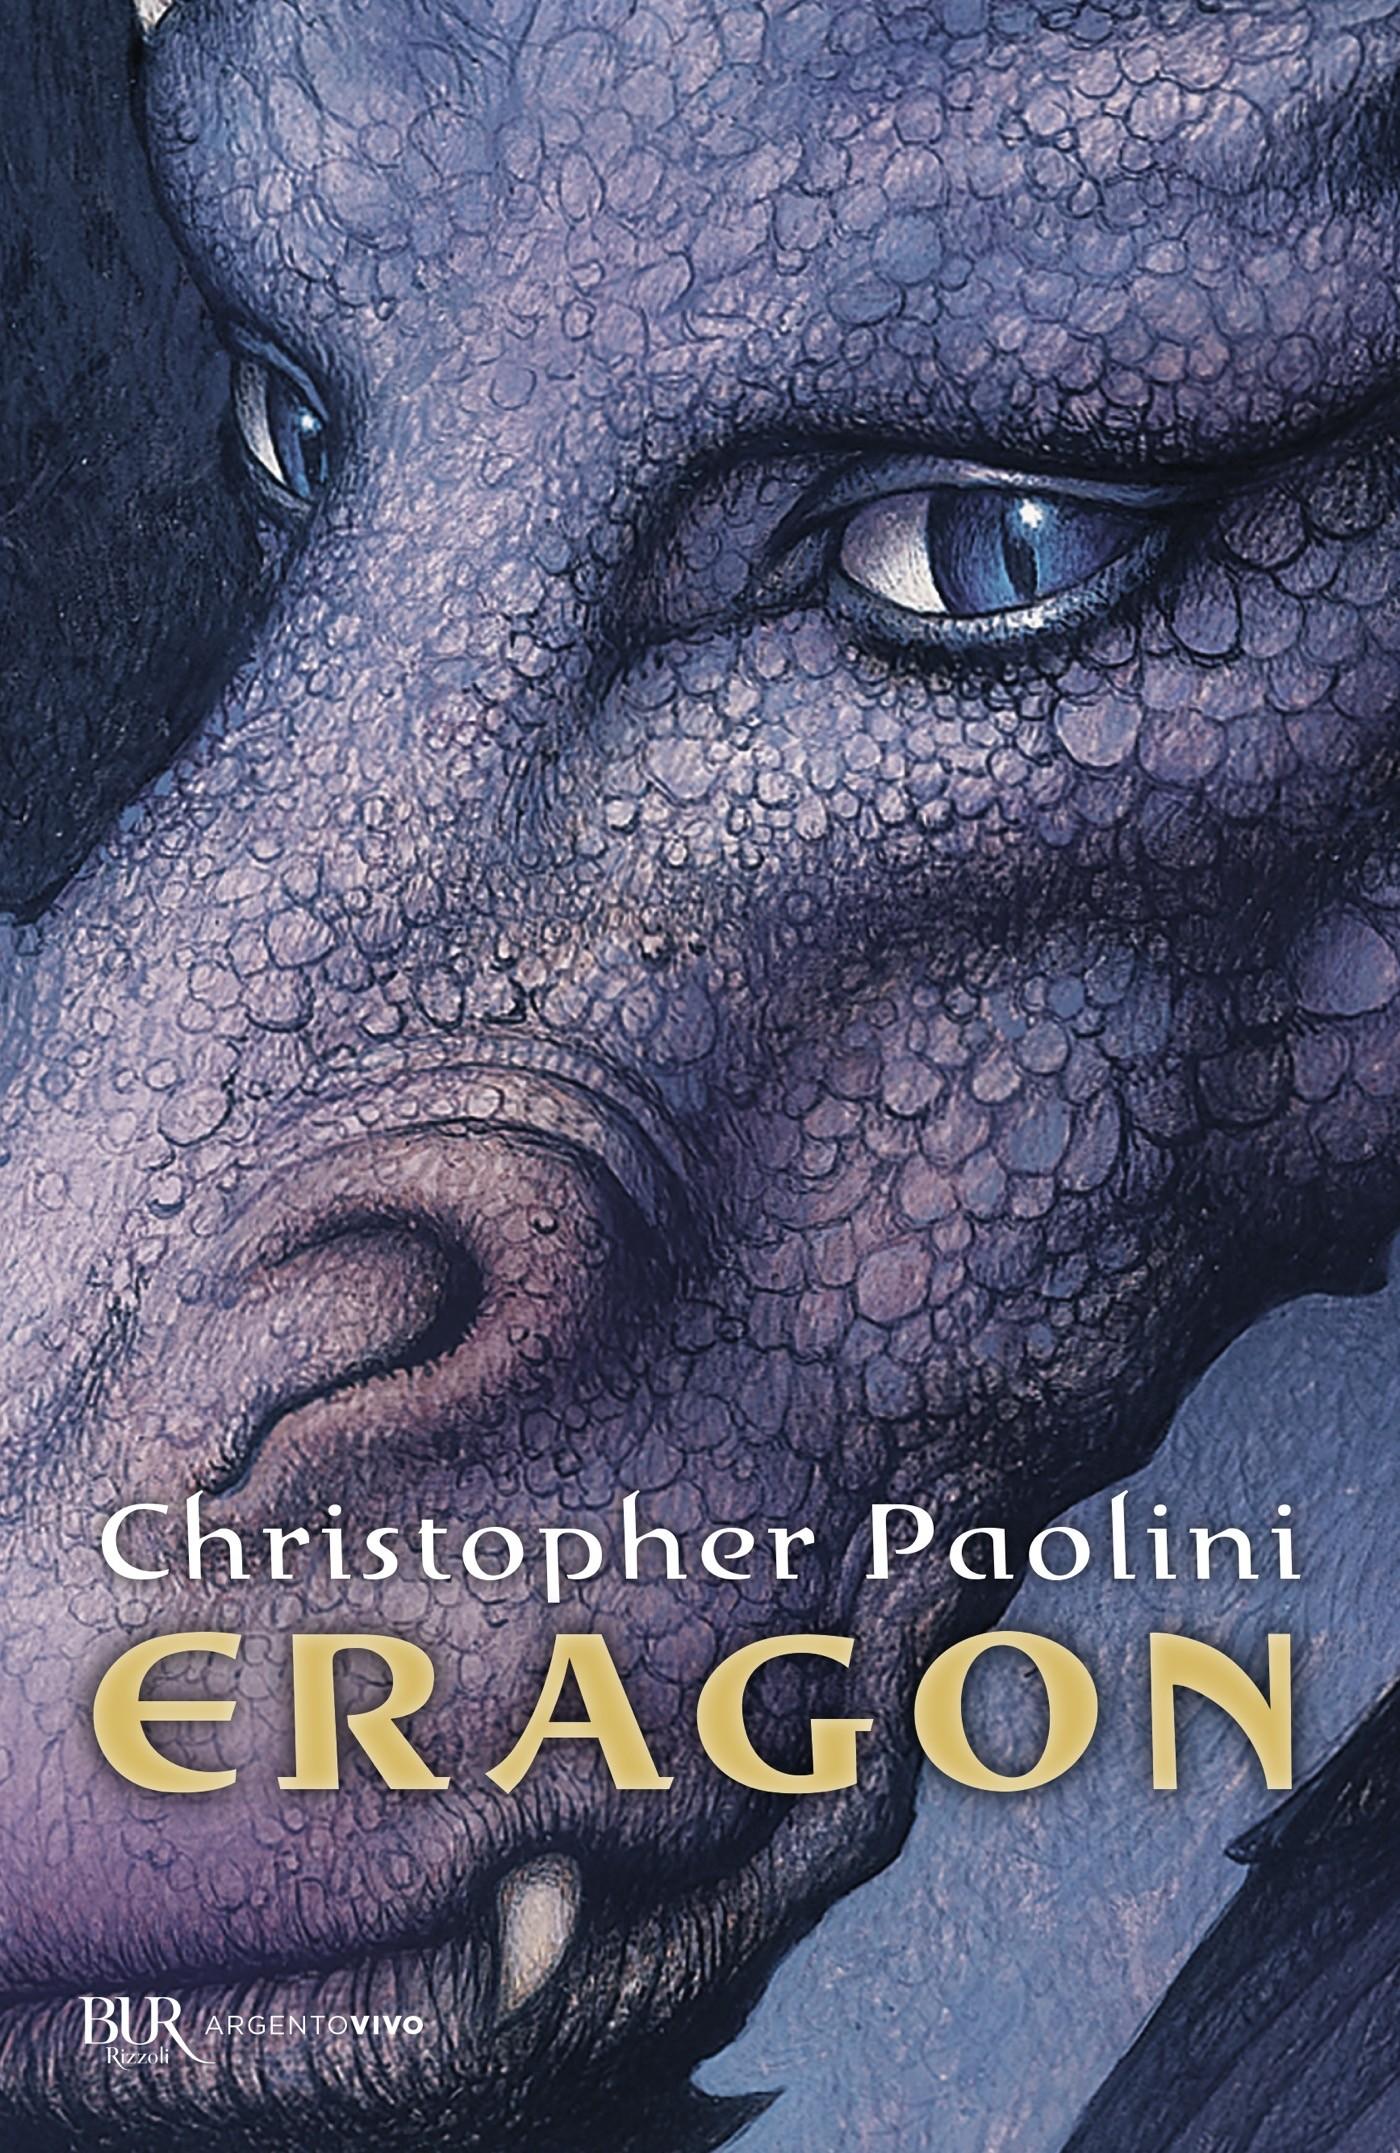 Book Cover Images Api : Faithsoftzone